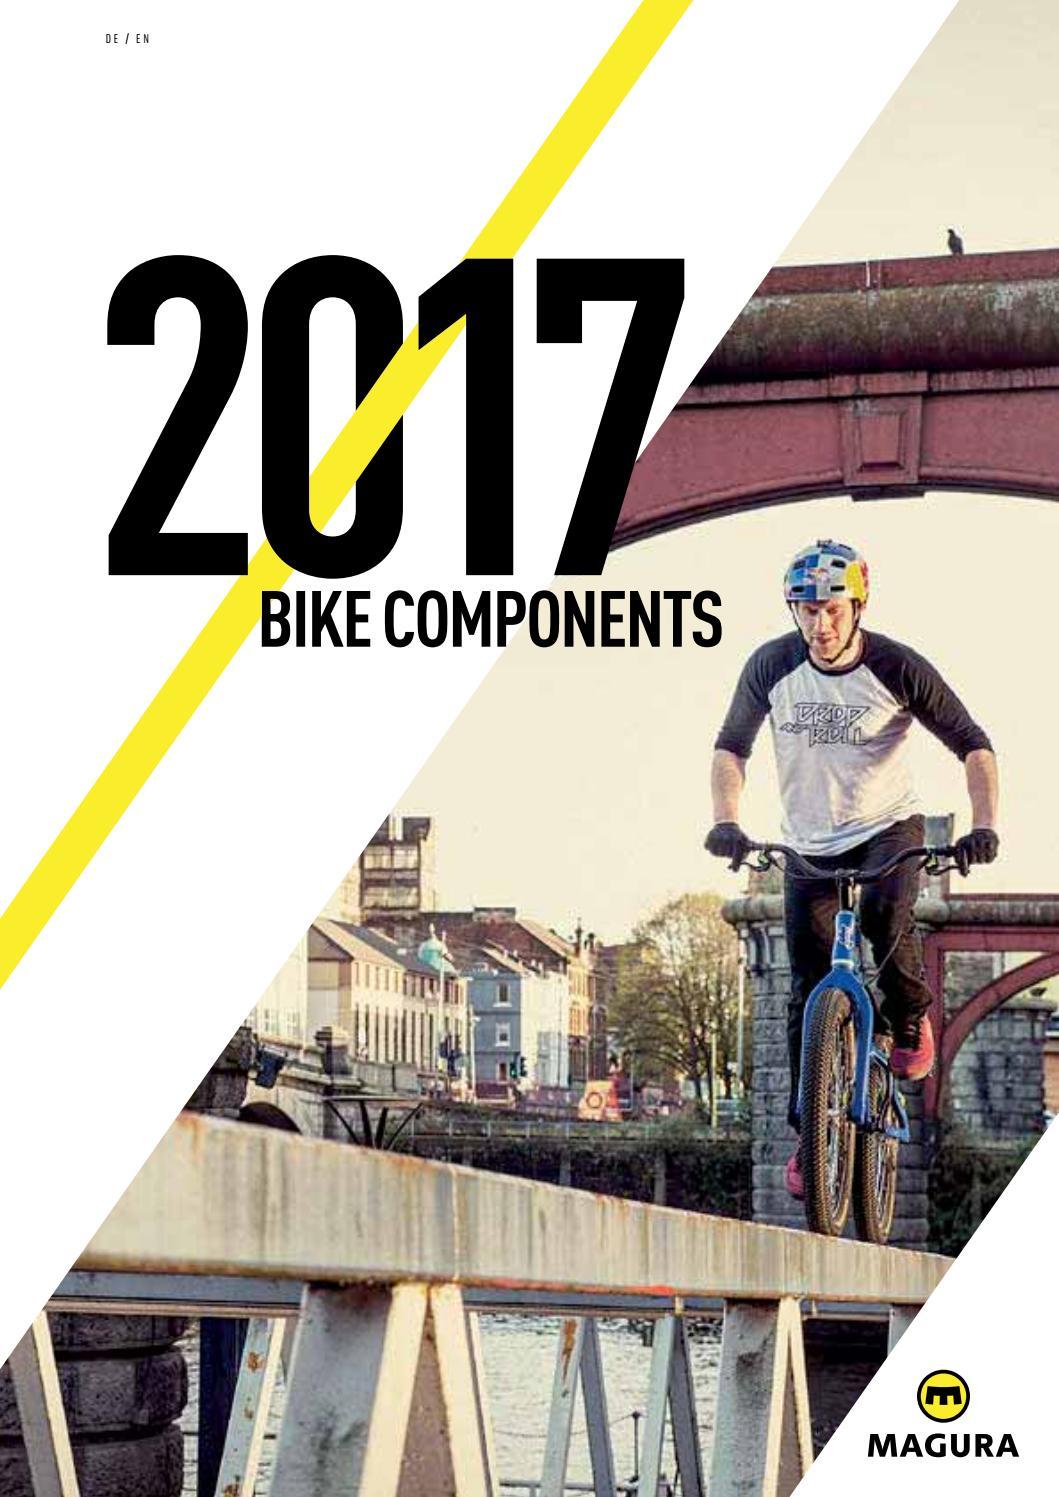 HL CHROME MOUNTAIN BICYCLE SEAT POST BIKE PARTS 401